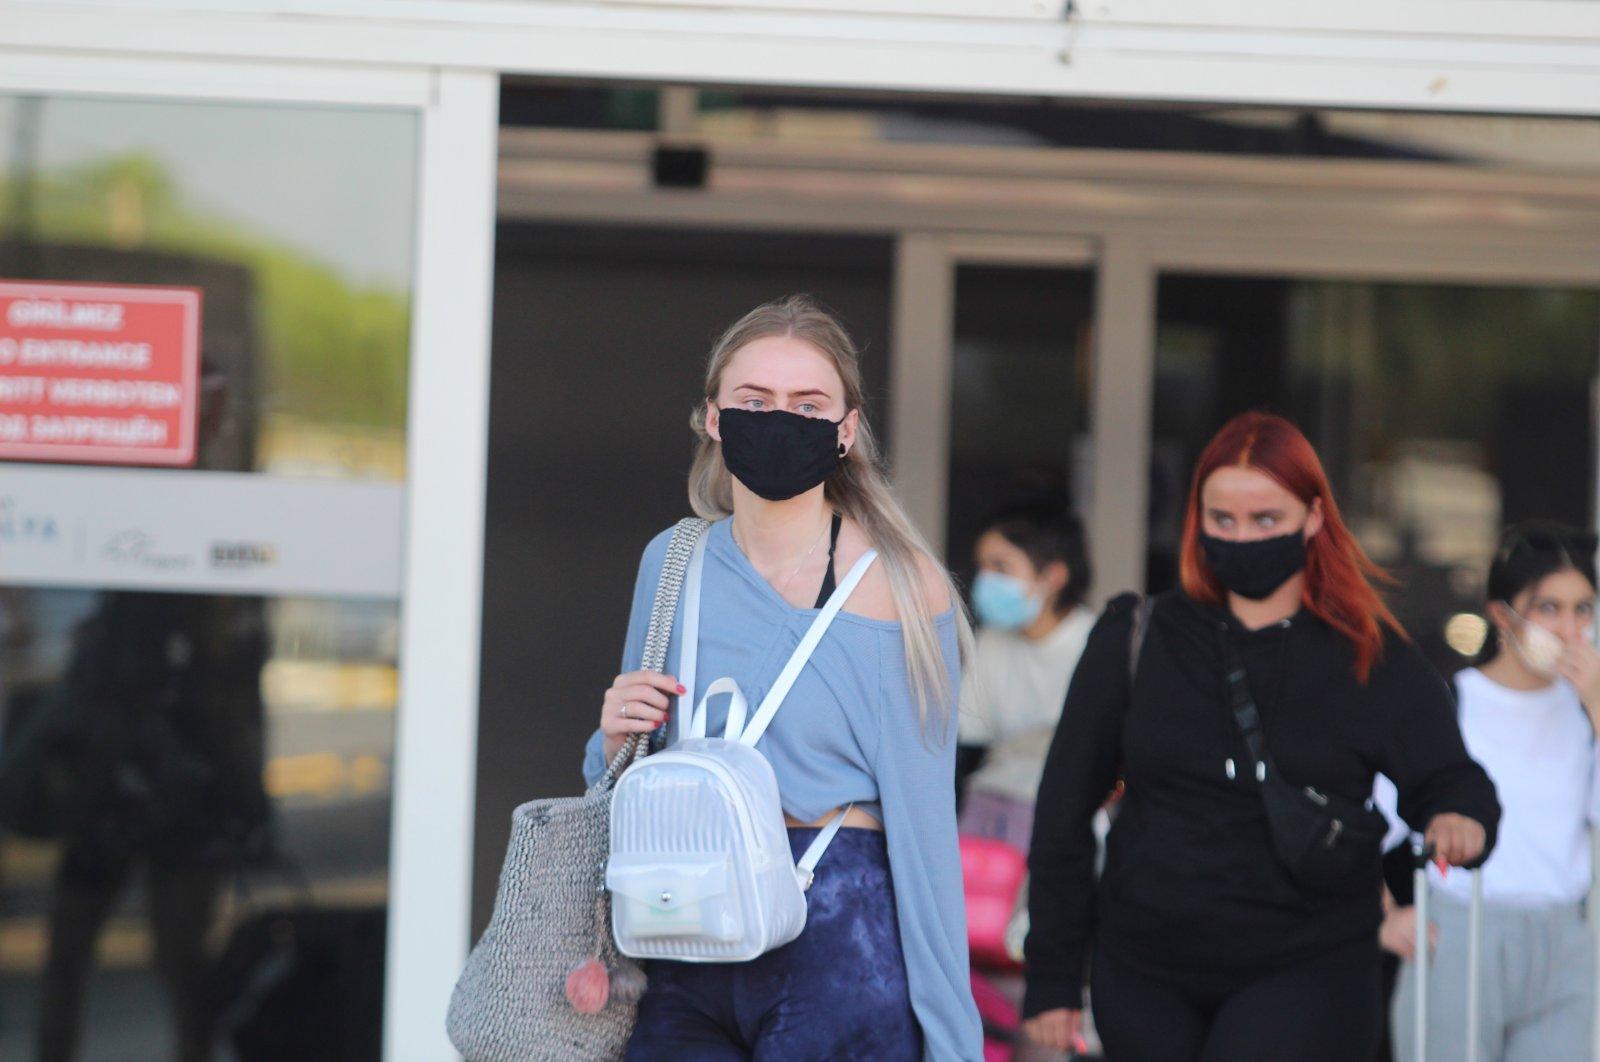 Passengers of the first charter plane from the U.K. following the coronavirus lockdowns arrive at Antalya Airport, Antalya, Turkey, July 15, 2020. (IHA Photo)